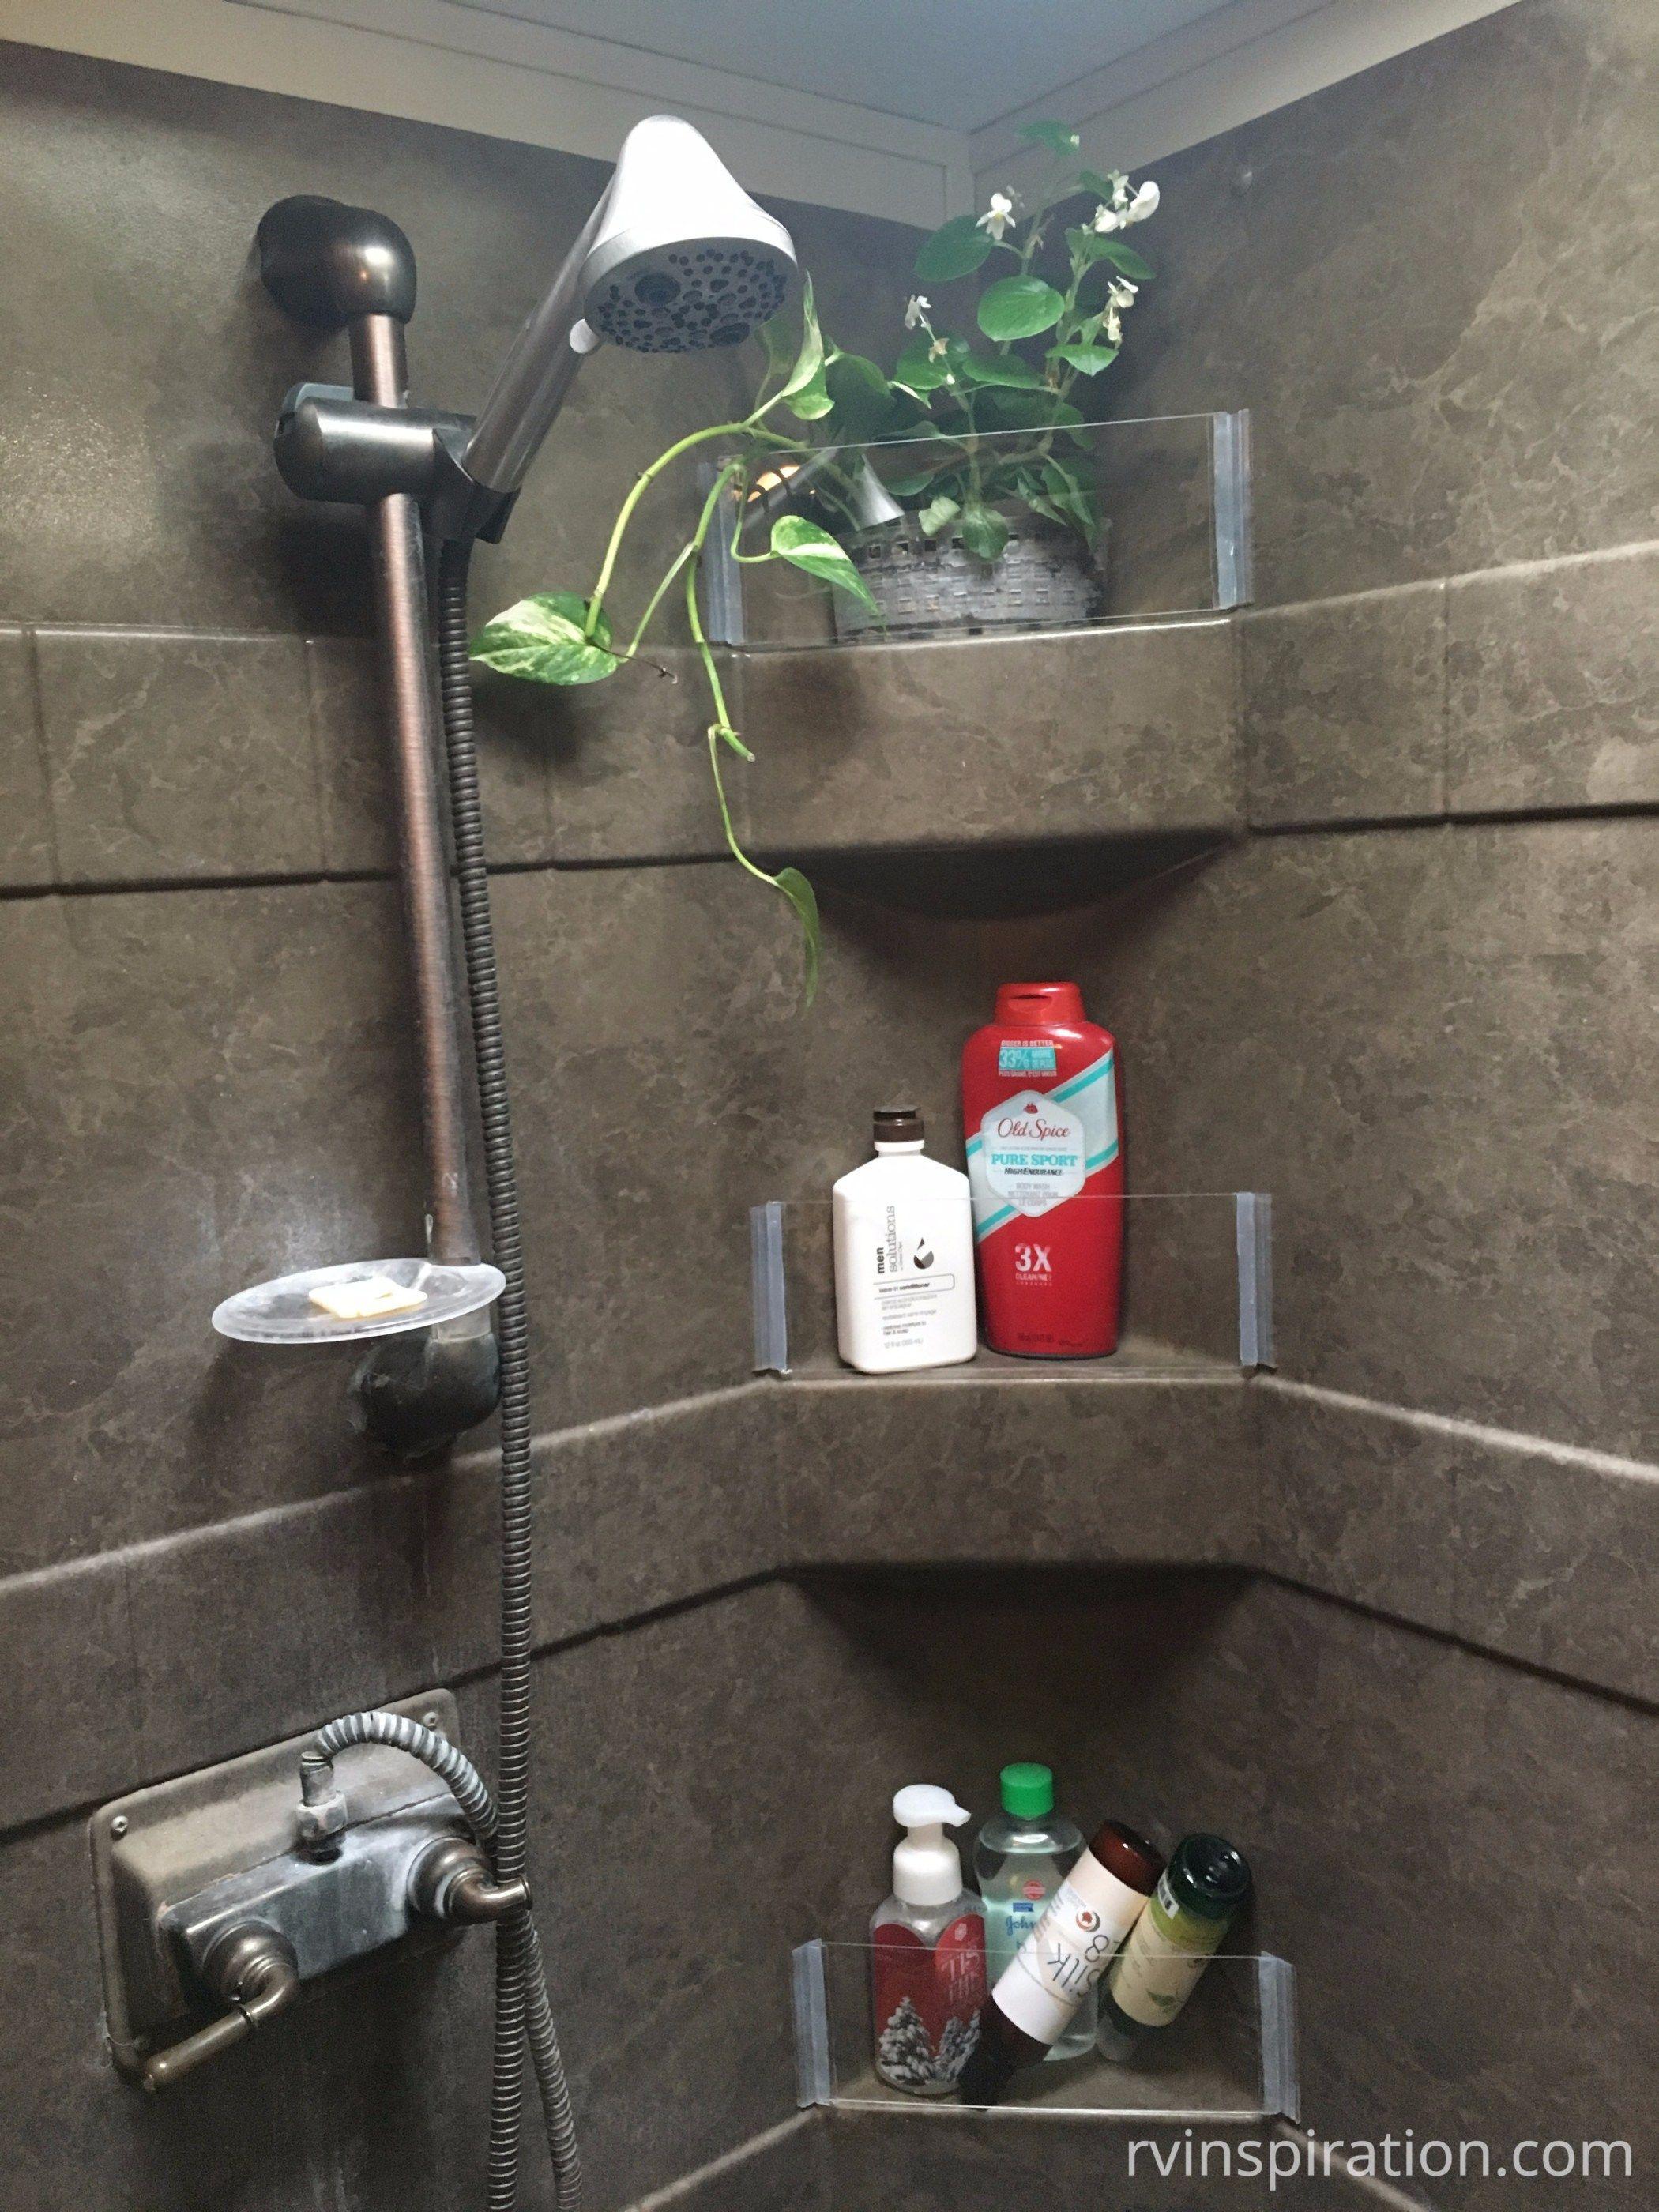 Rv Bathroom Storage Organization Ideas And Accessories Shower Shelves Bathroom Storage Organization Shower Remodel